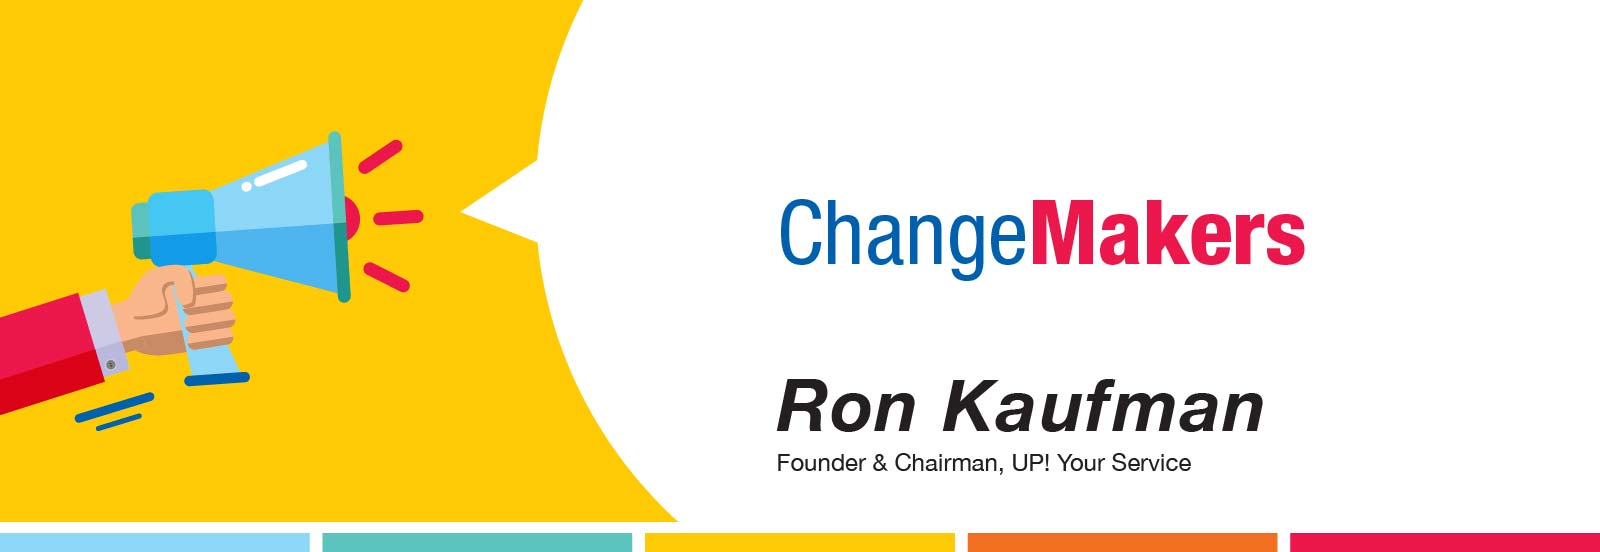 Ron Kaufman